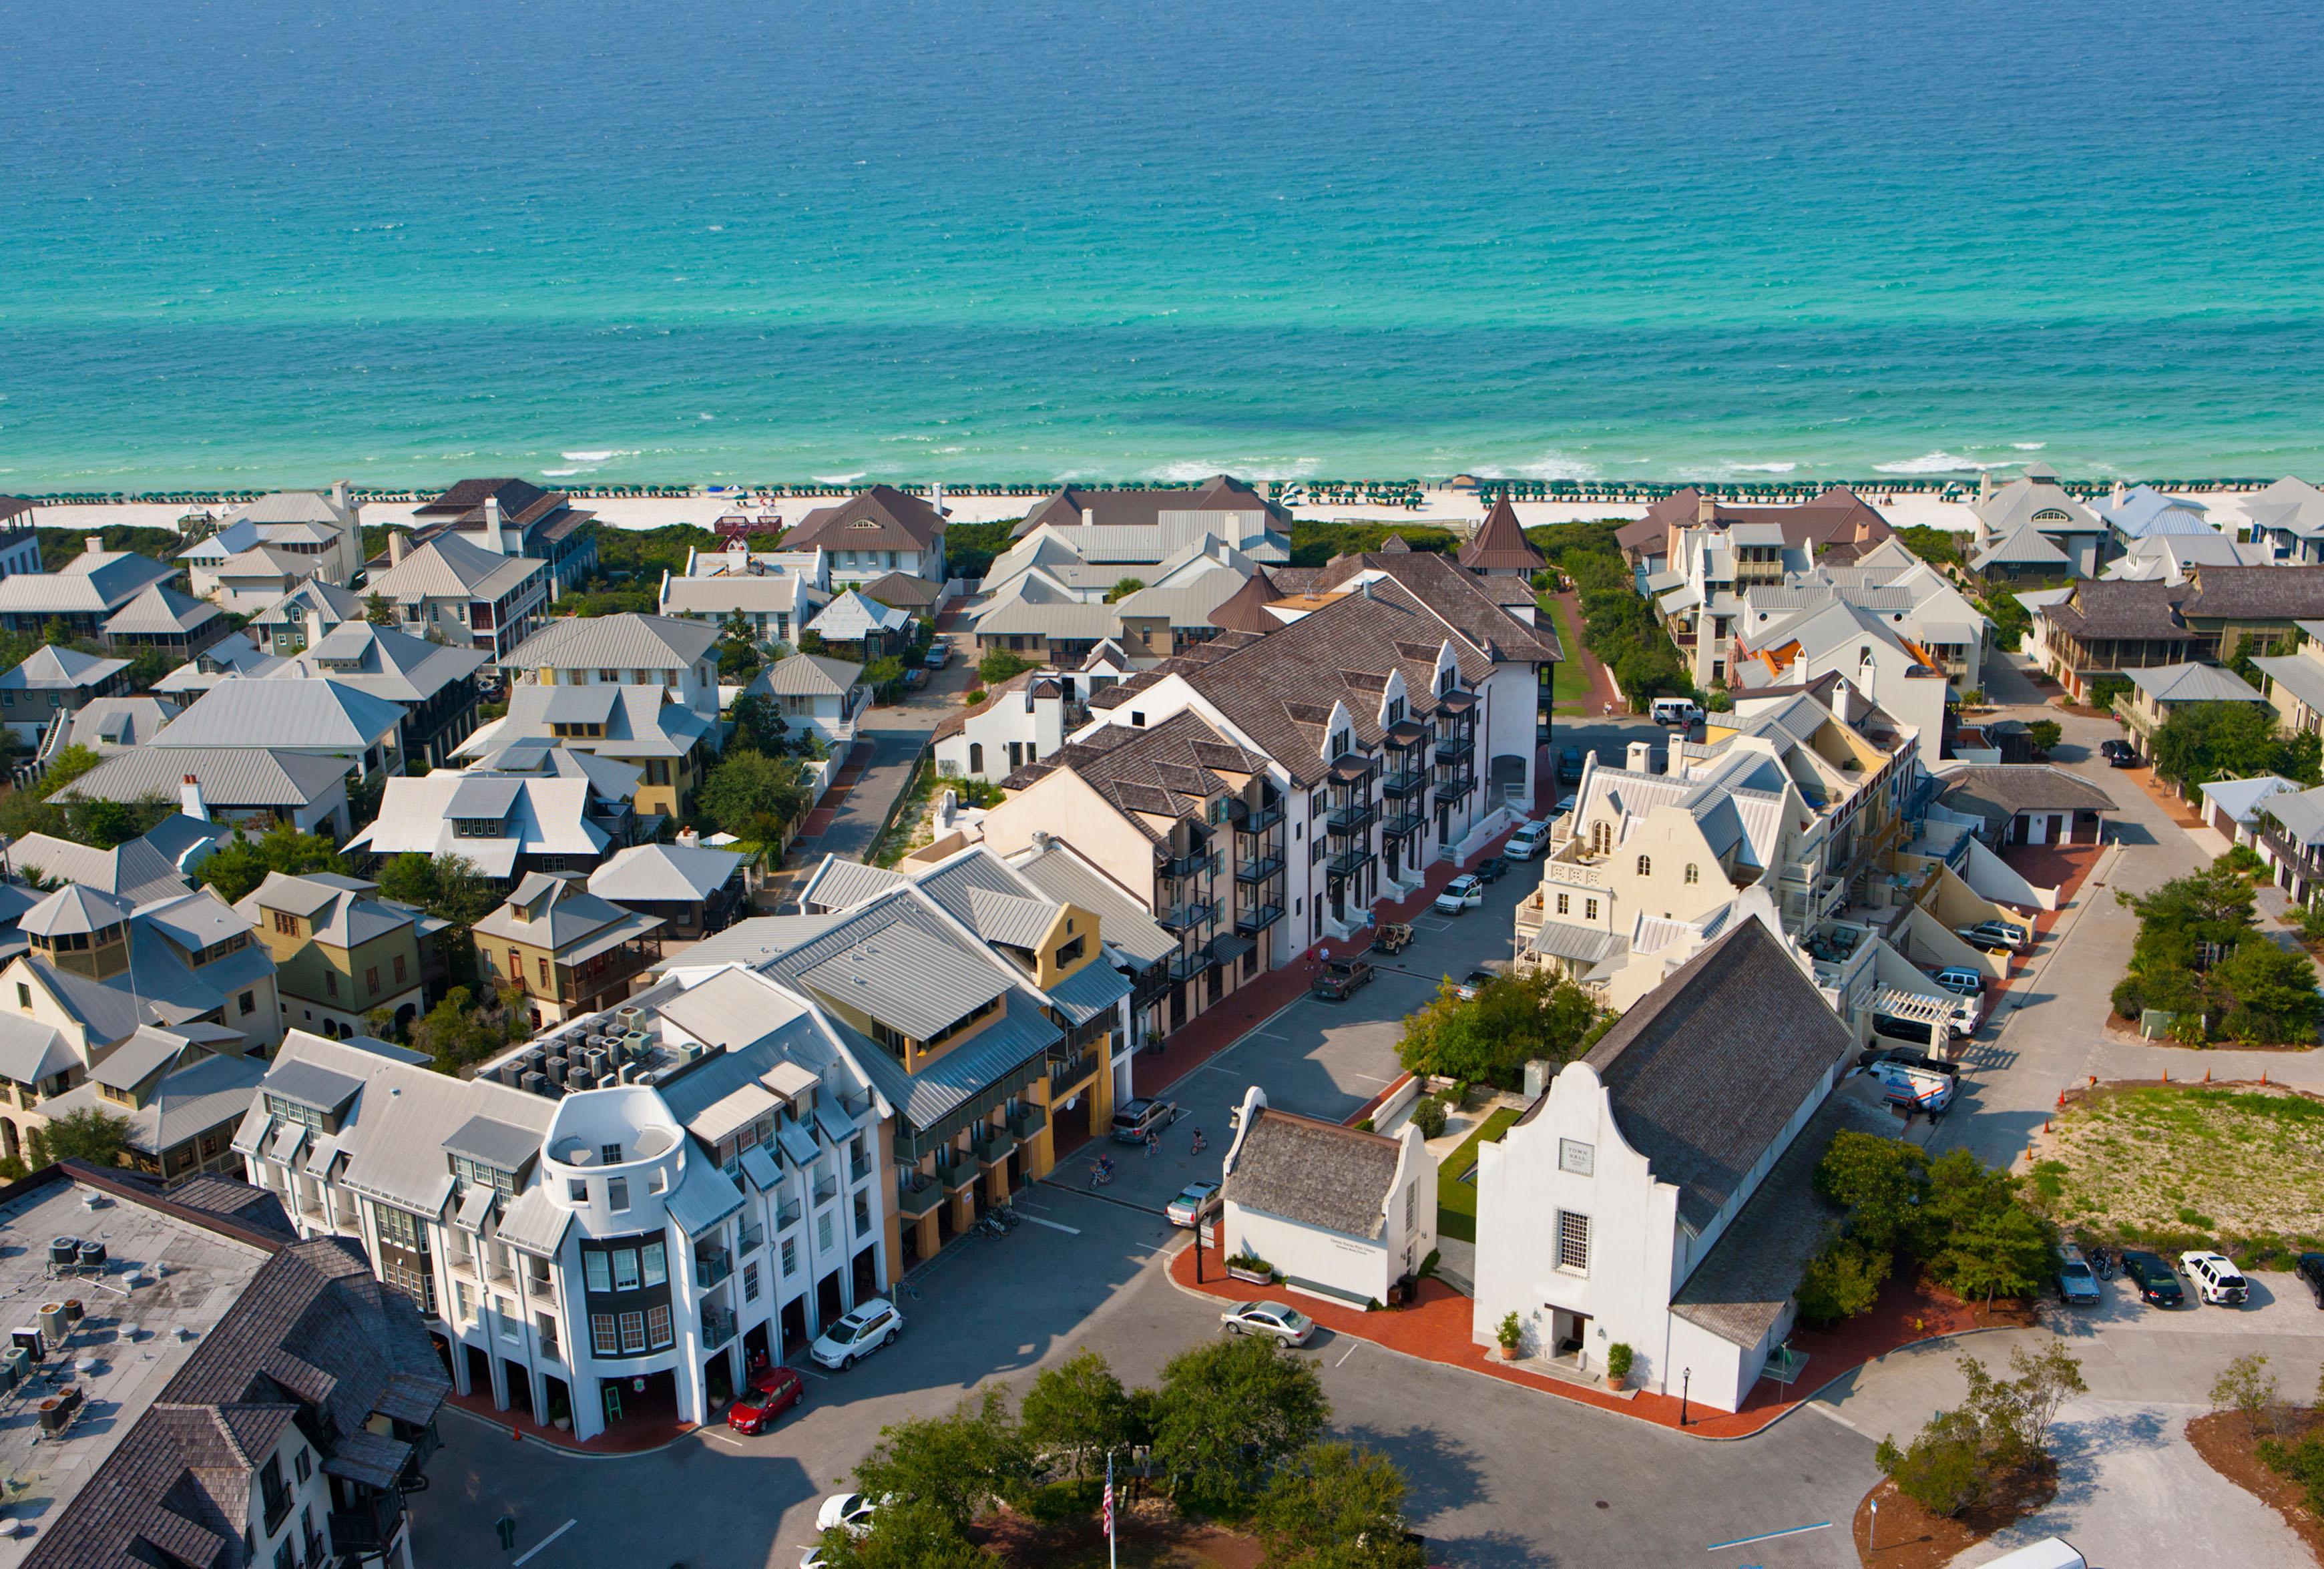 Rosemary Beach | Visit South Walton - Rosemary Beach Florida Map